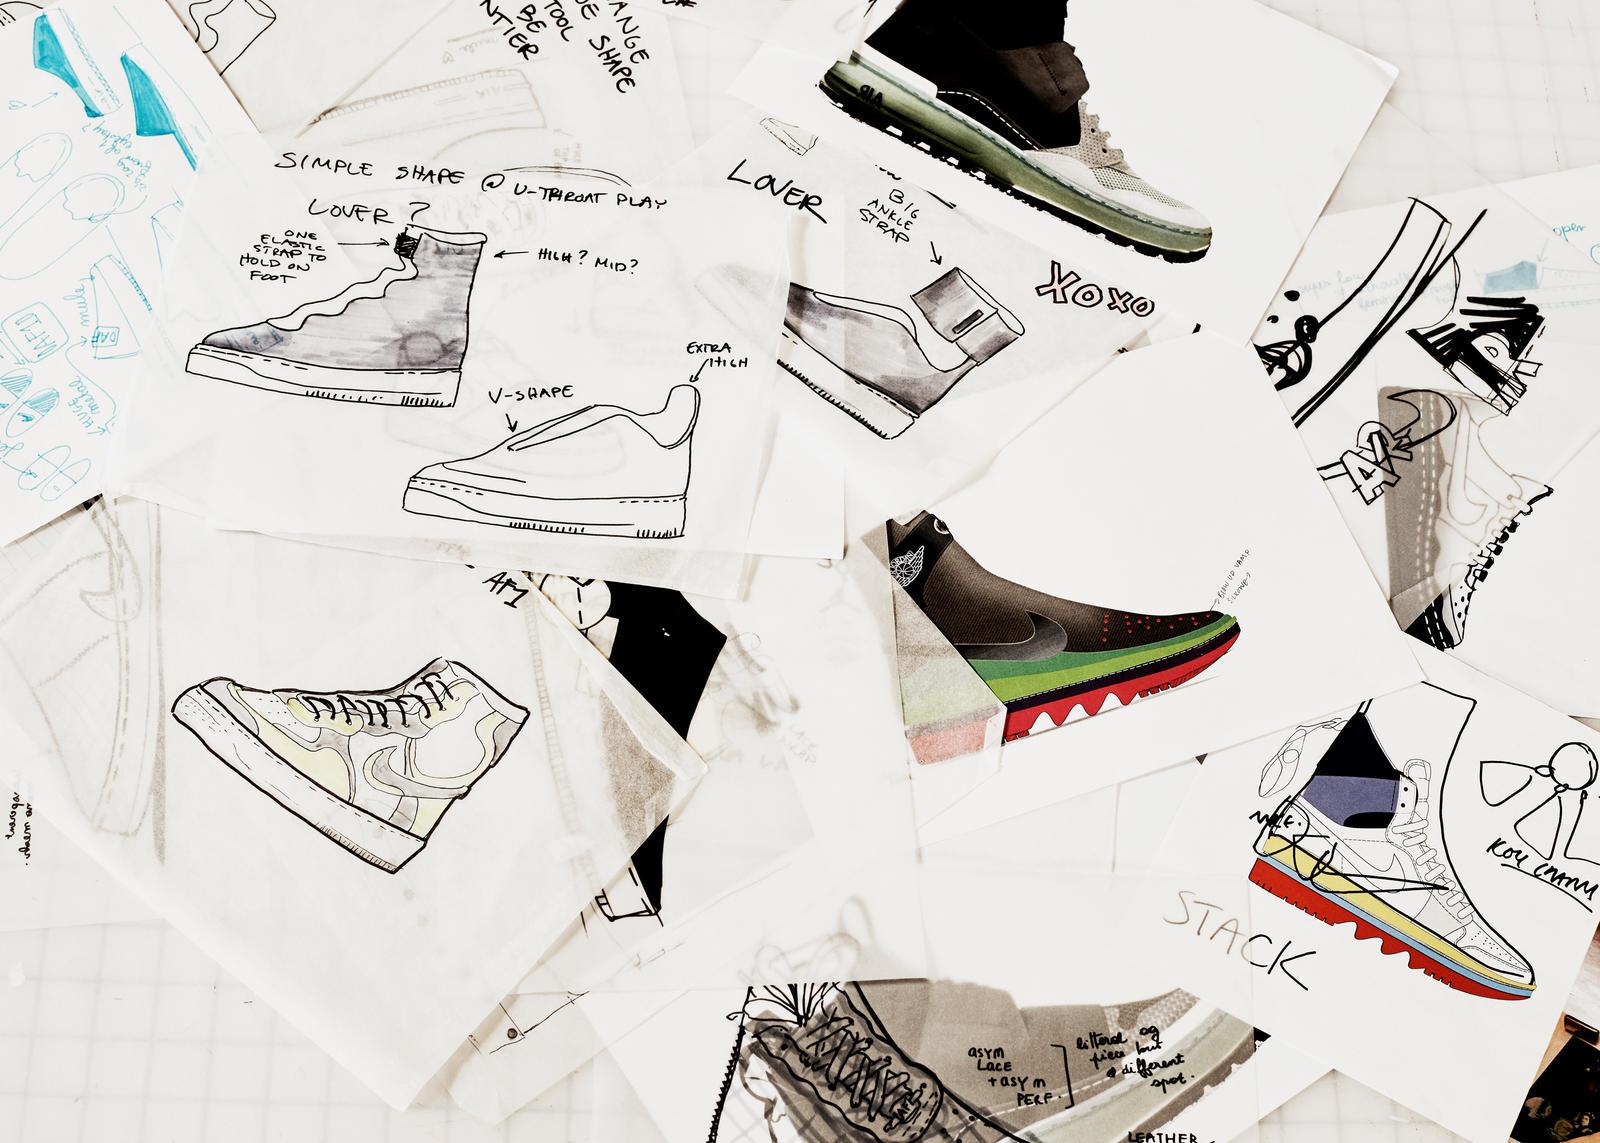 14 Women Redesign the Air Jordan 1 and Air Force 1 for Nike